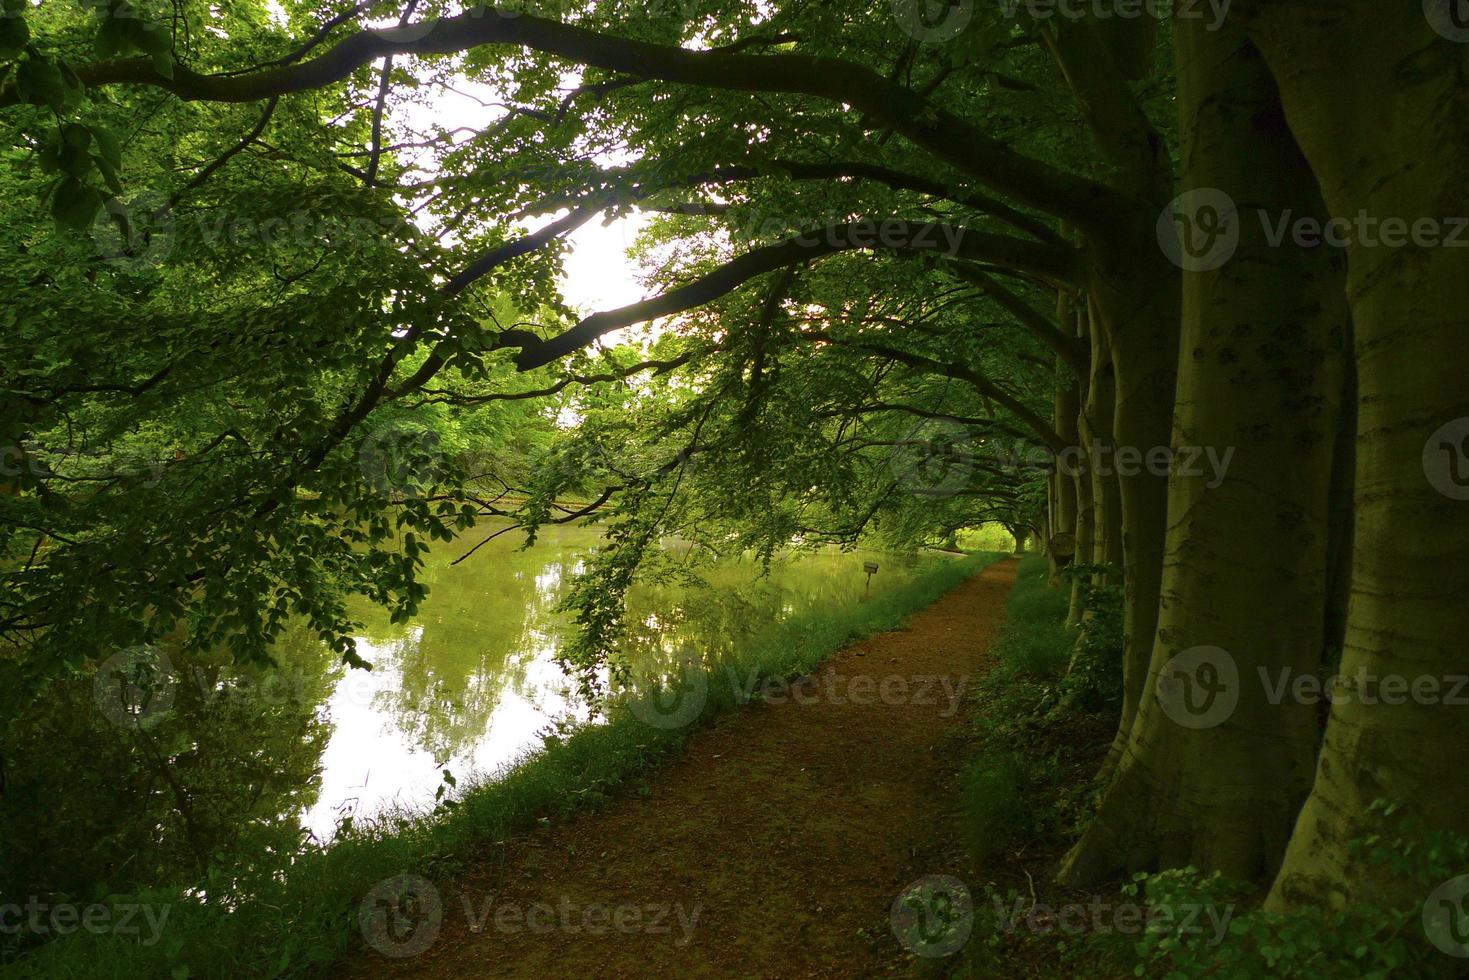 idyllisk miljö med trädgårdsväg nära sjön i Sverige foto